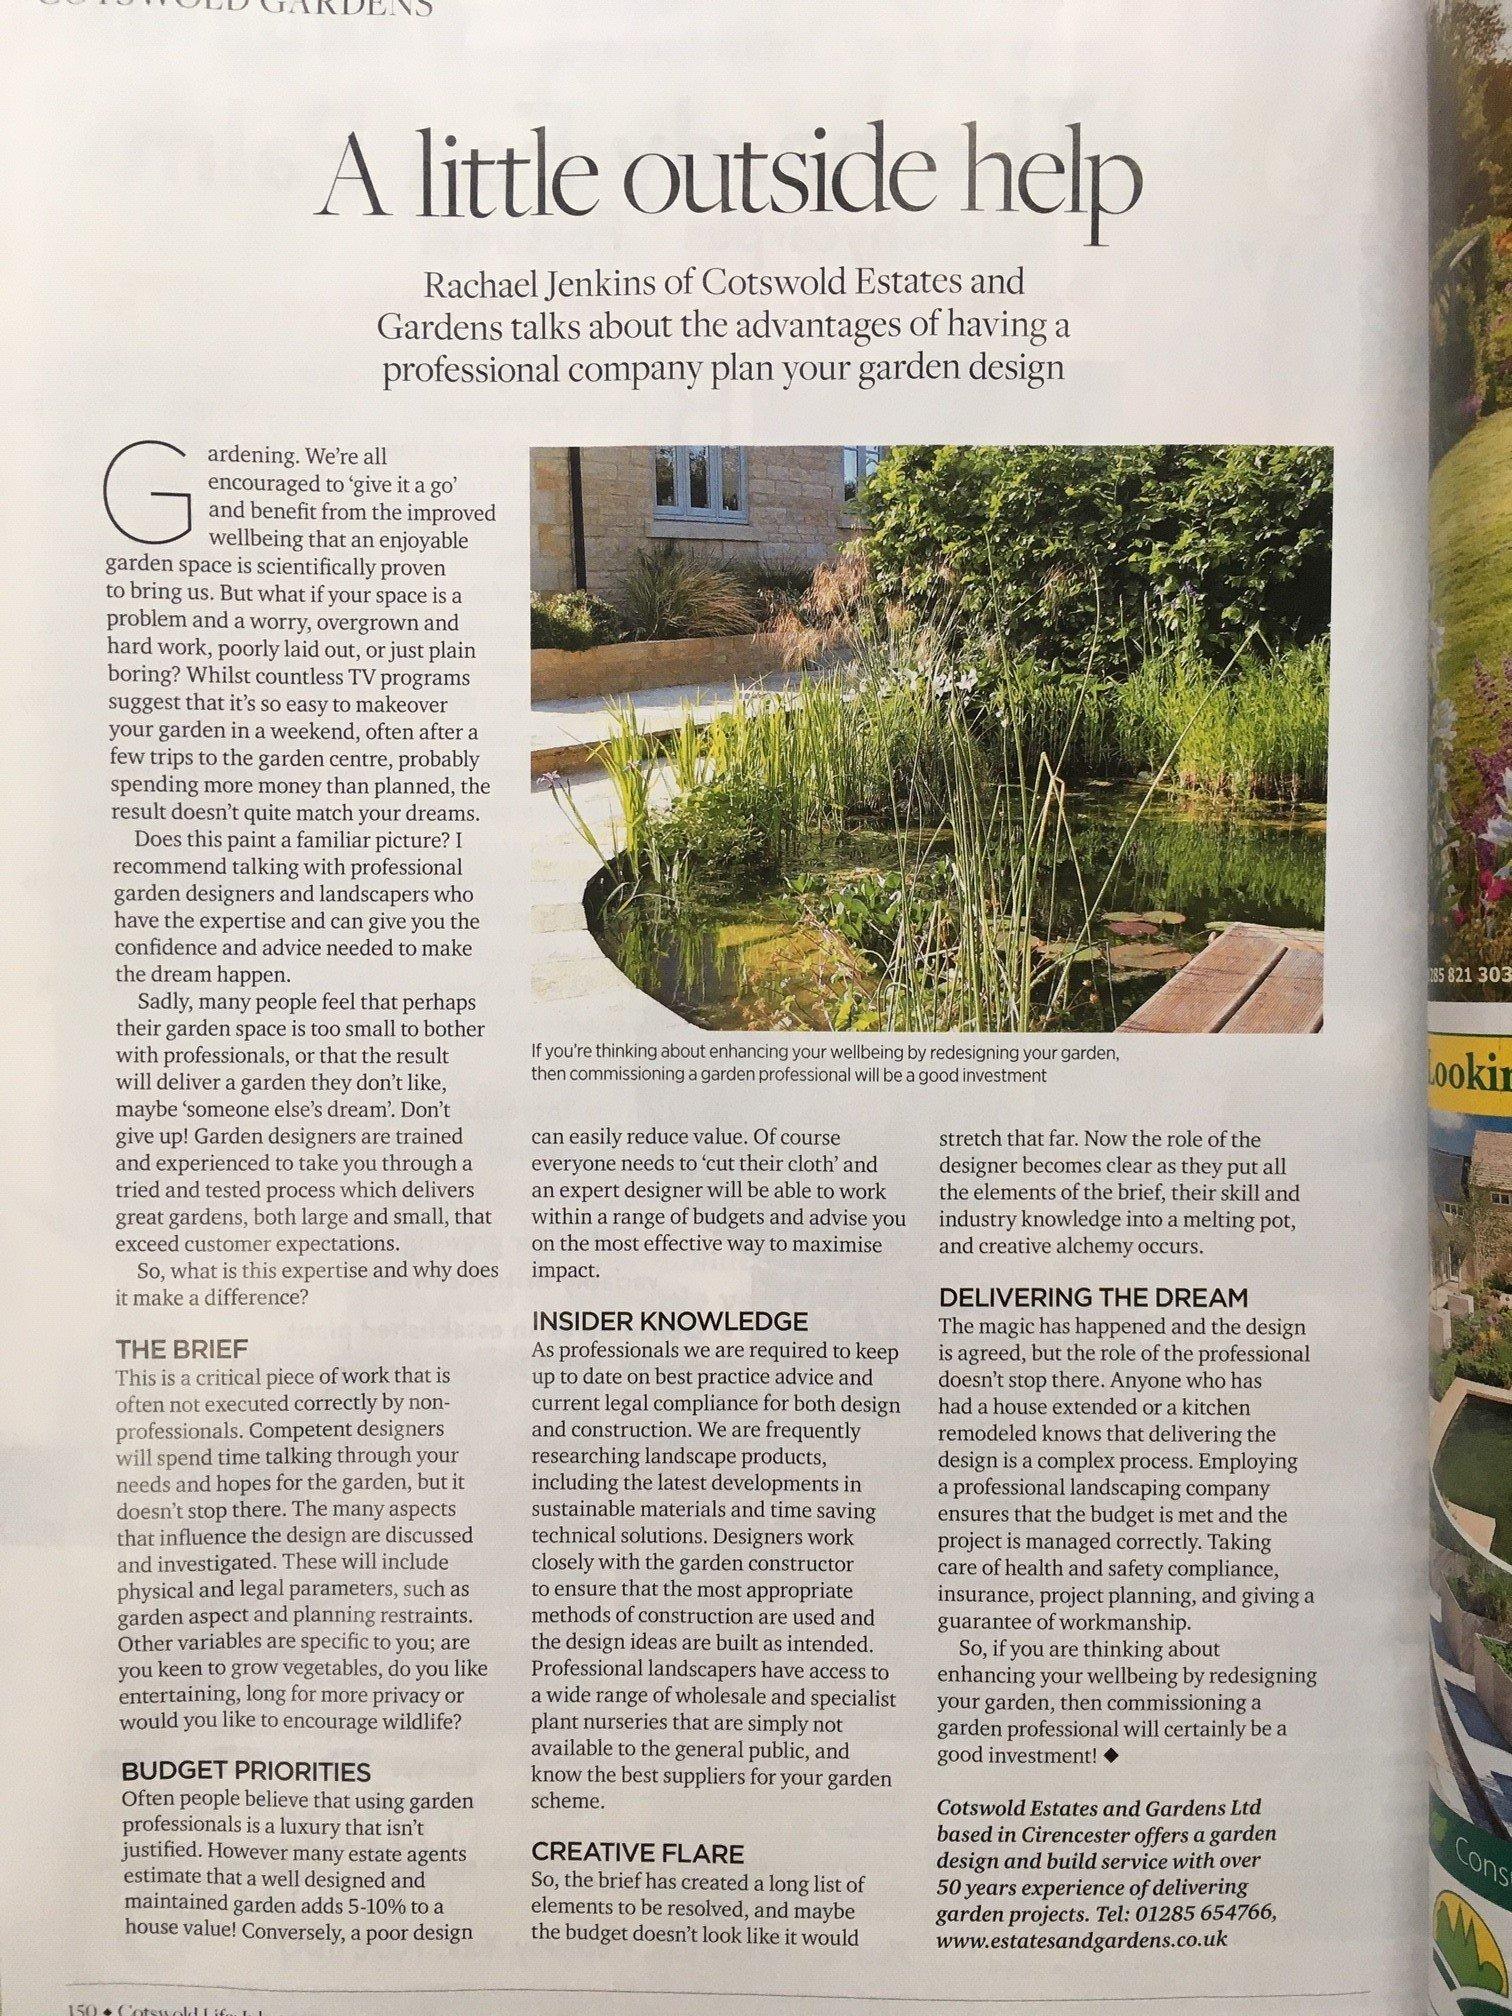 A little Outside help magazine article subject using a garden deisgner